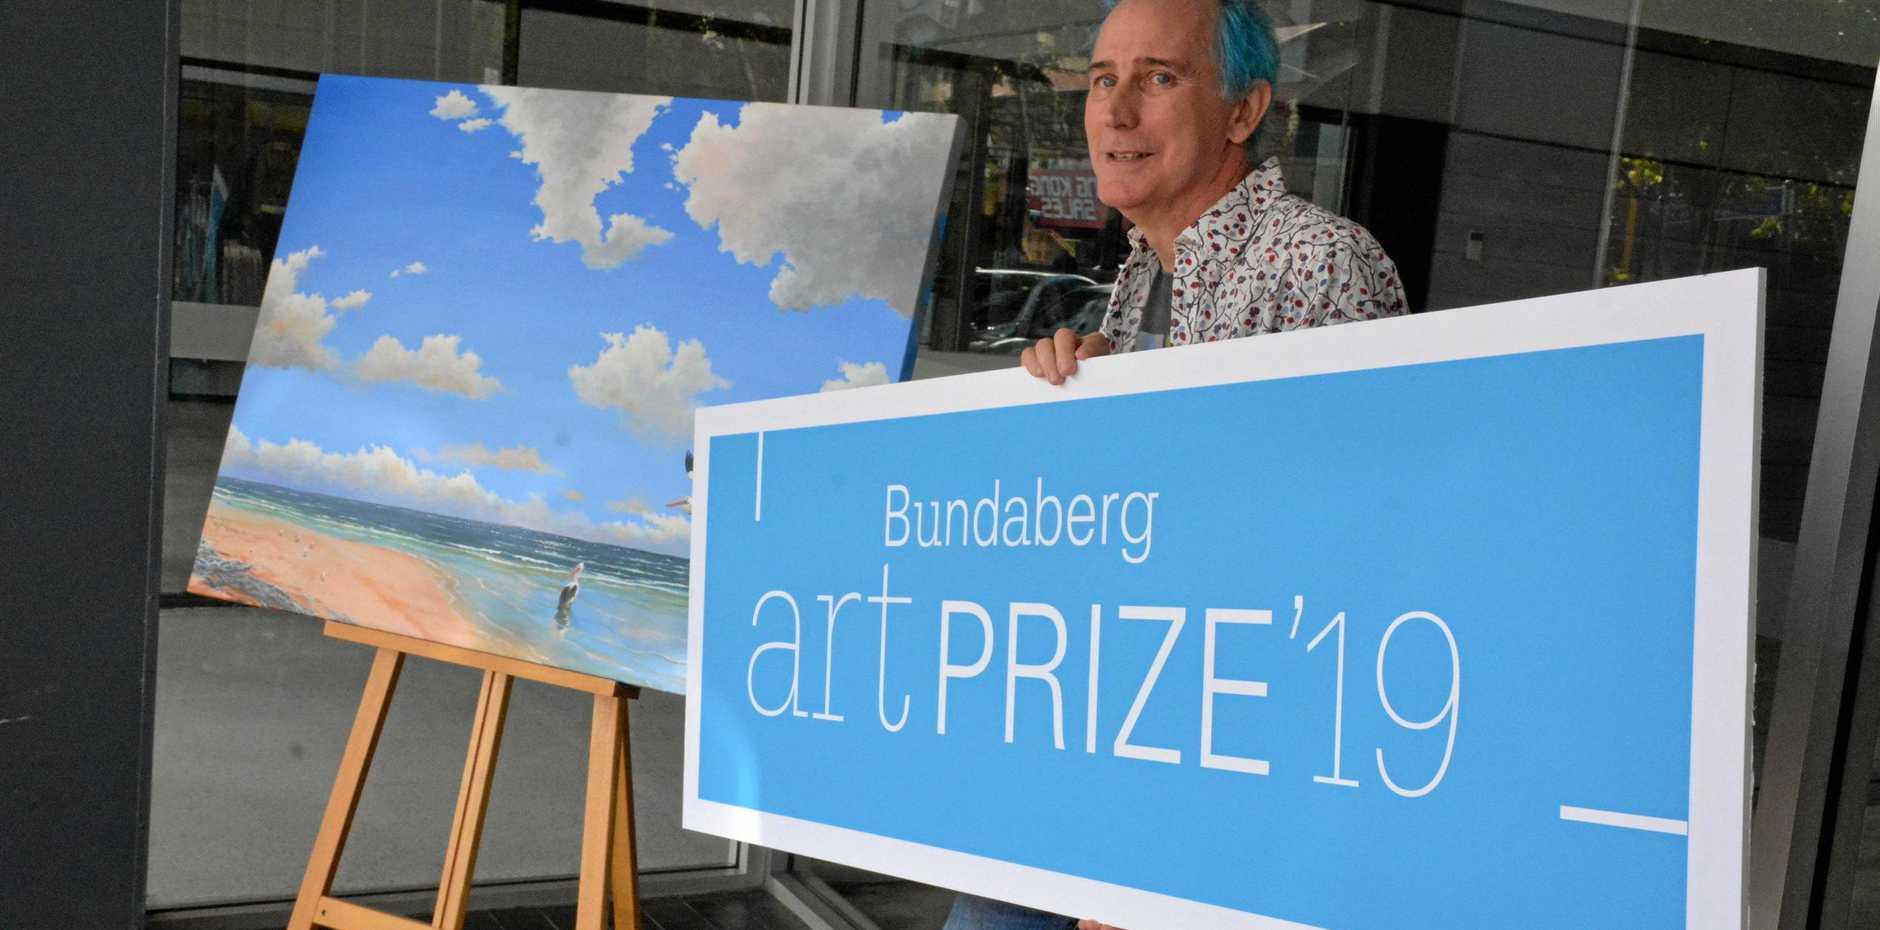 BIG BUCKS: Bundaberg Arts Festival president Phil Oakley announces the $10,000 prize for the winner of the 2019 Art Prize.